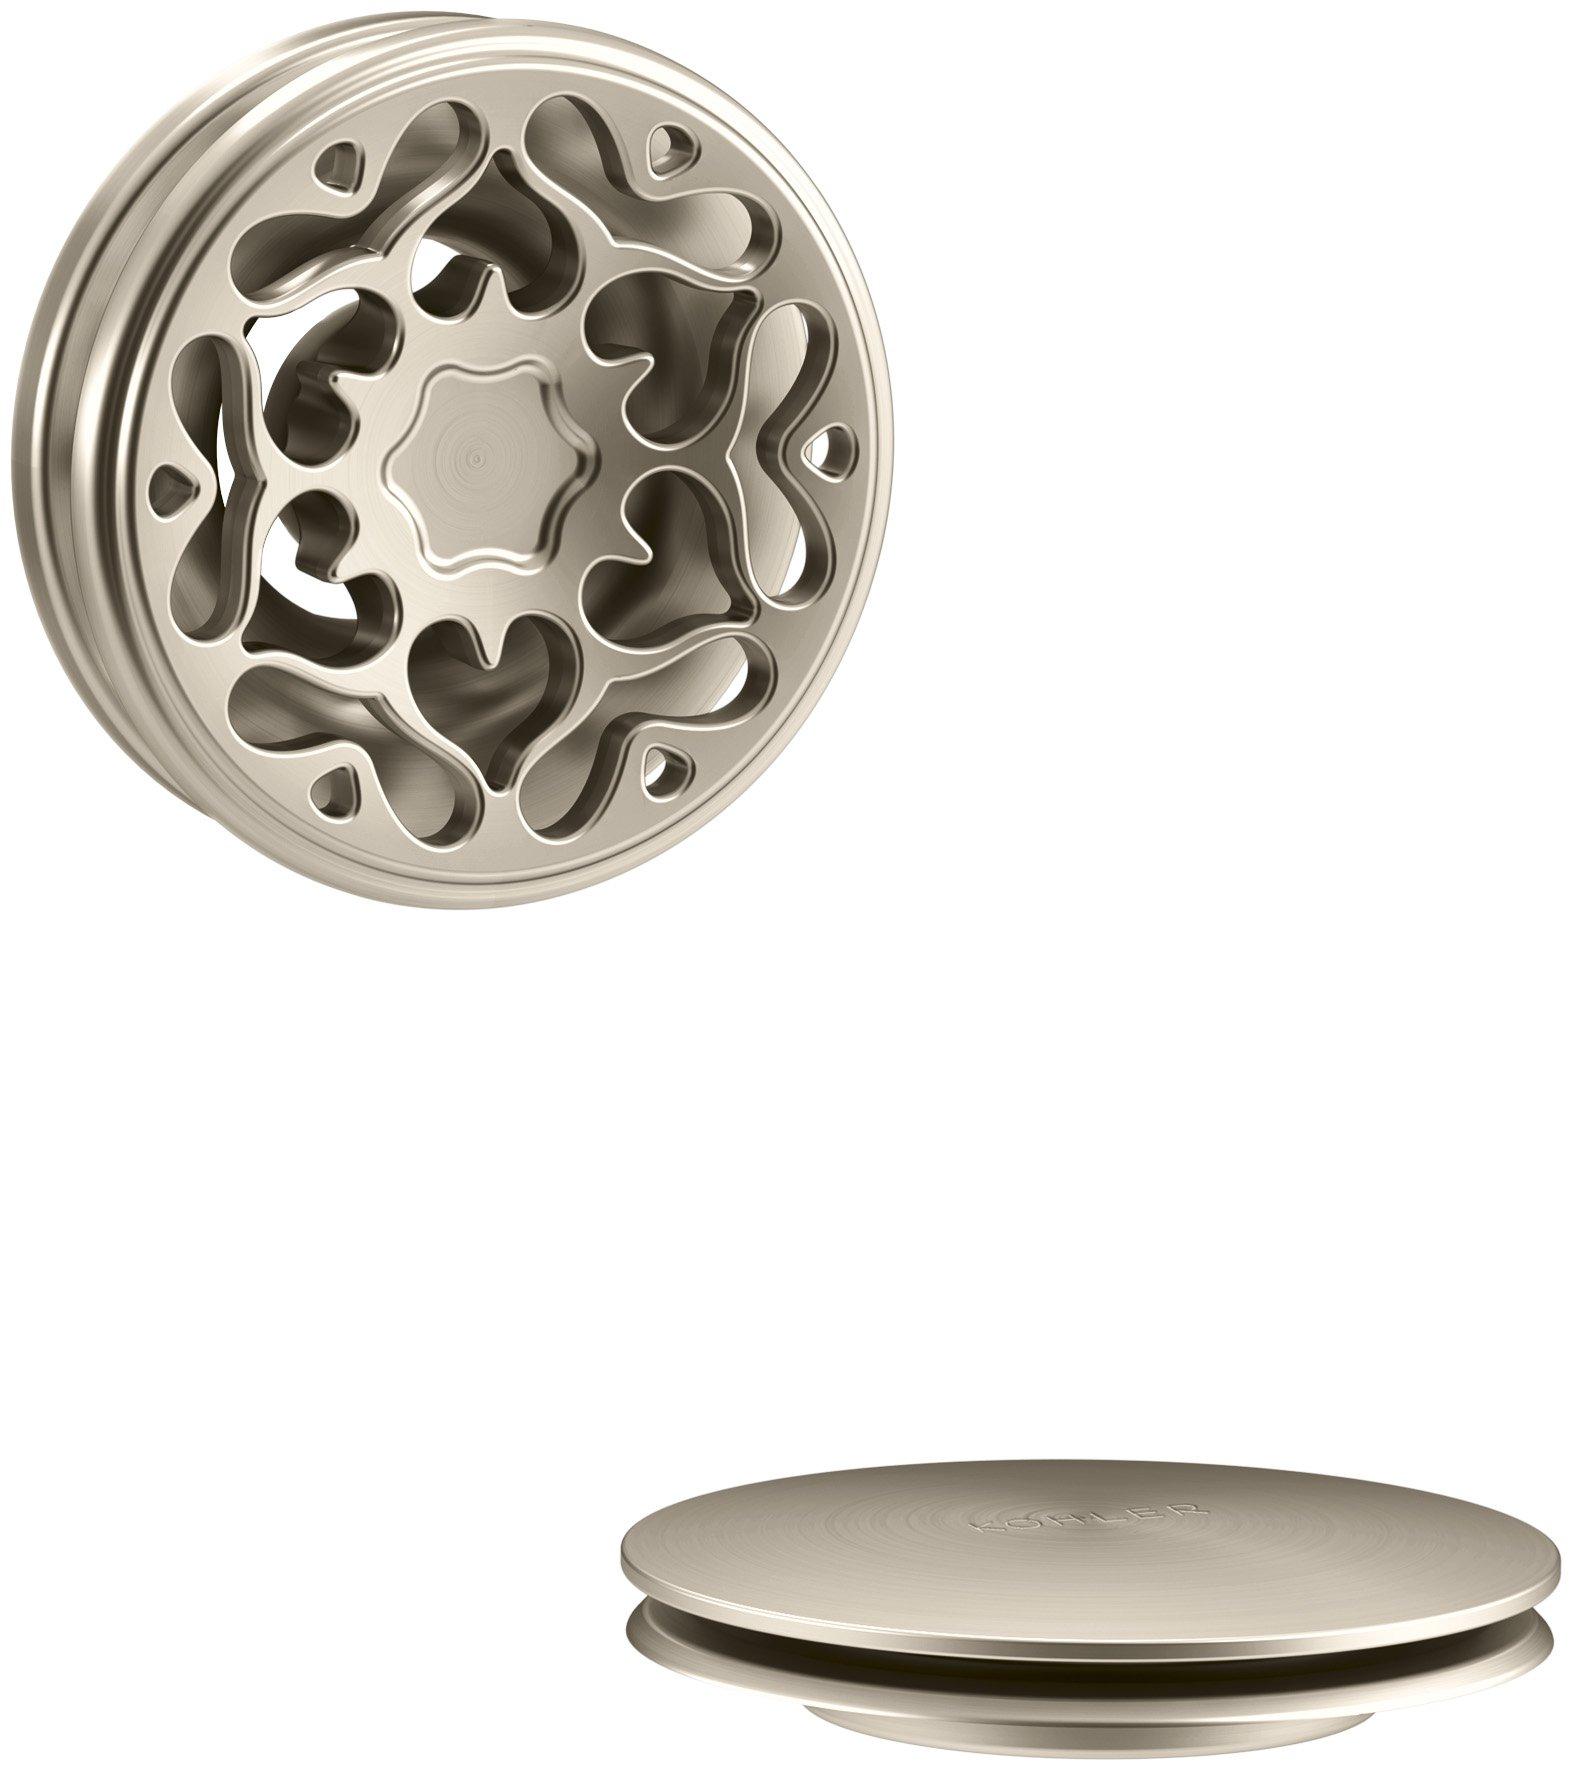 KOHLER K-T37397-BV PureFlo Cable Bath Drain Trim with Victorian Push Button Handle, Vibrant Brushed Bronze by Kohler